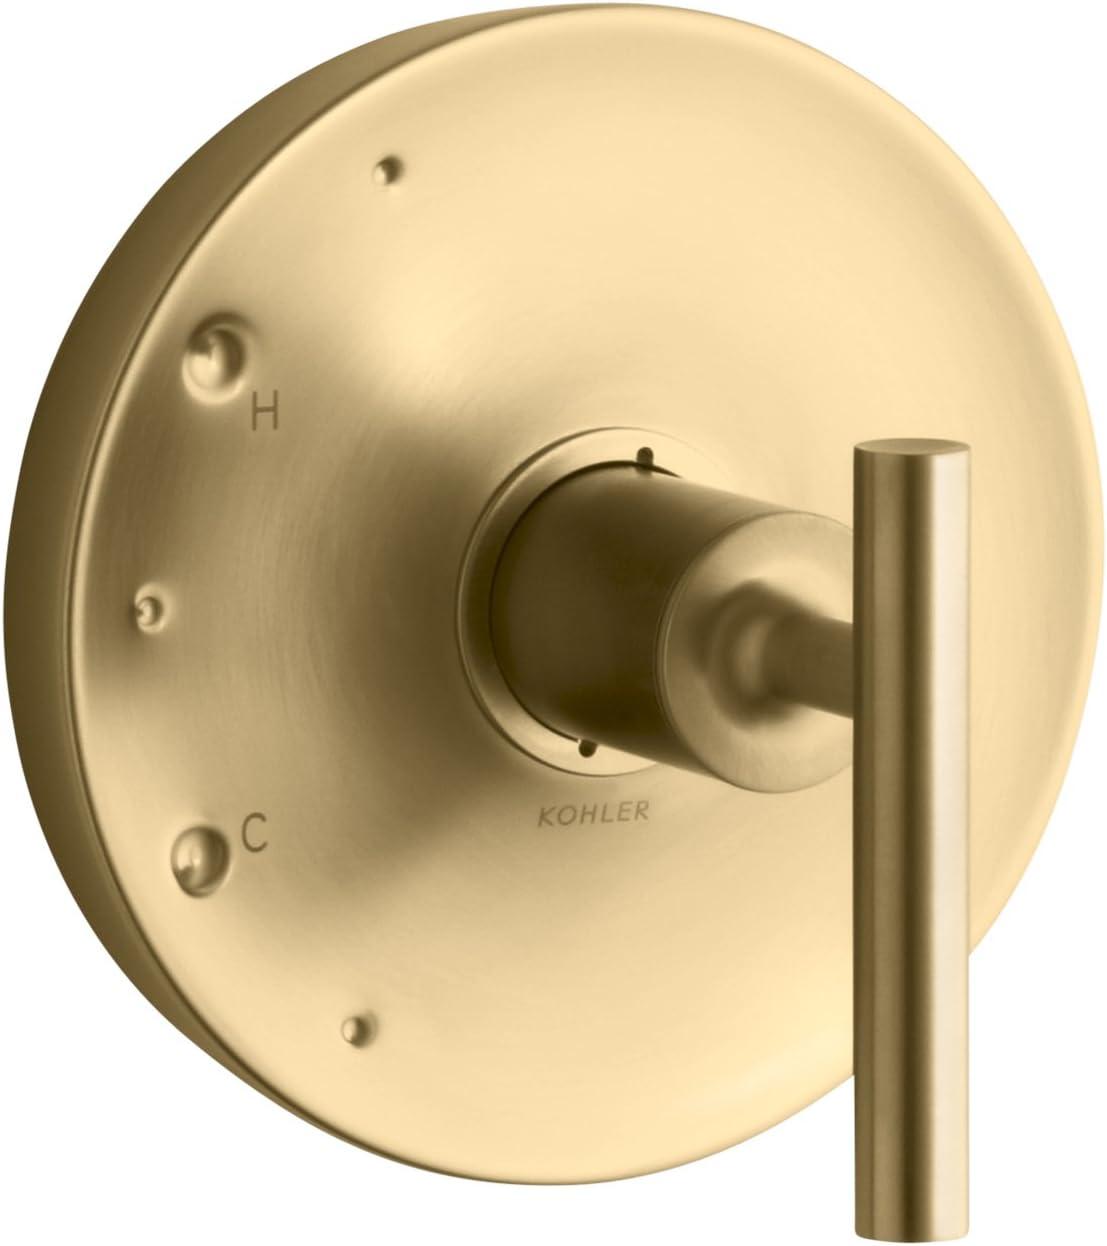 Kohler Ts14423 4 Bgd Purist Rite Temp Valve Trim With Lever Handle Vibrant Moderne Brushed Gold Amazon Com